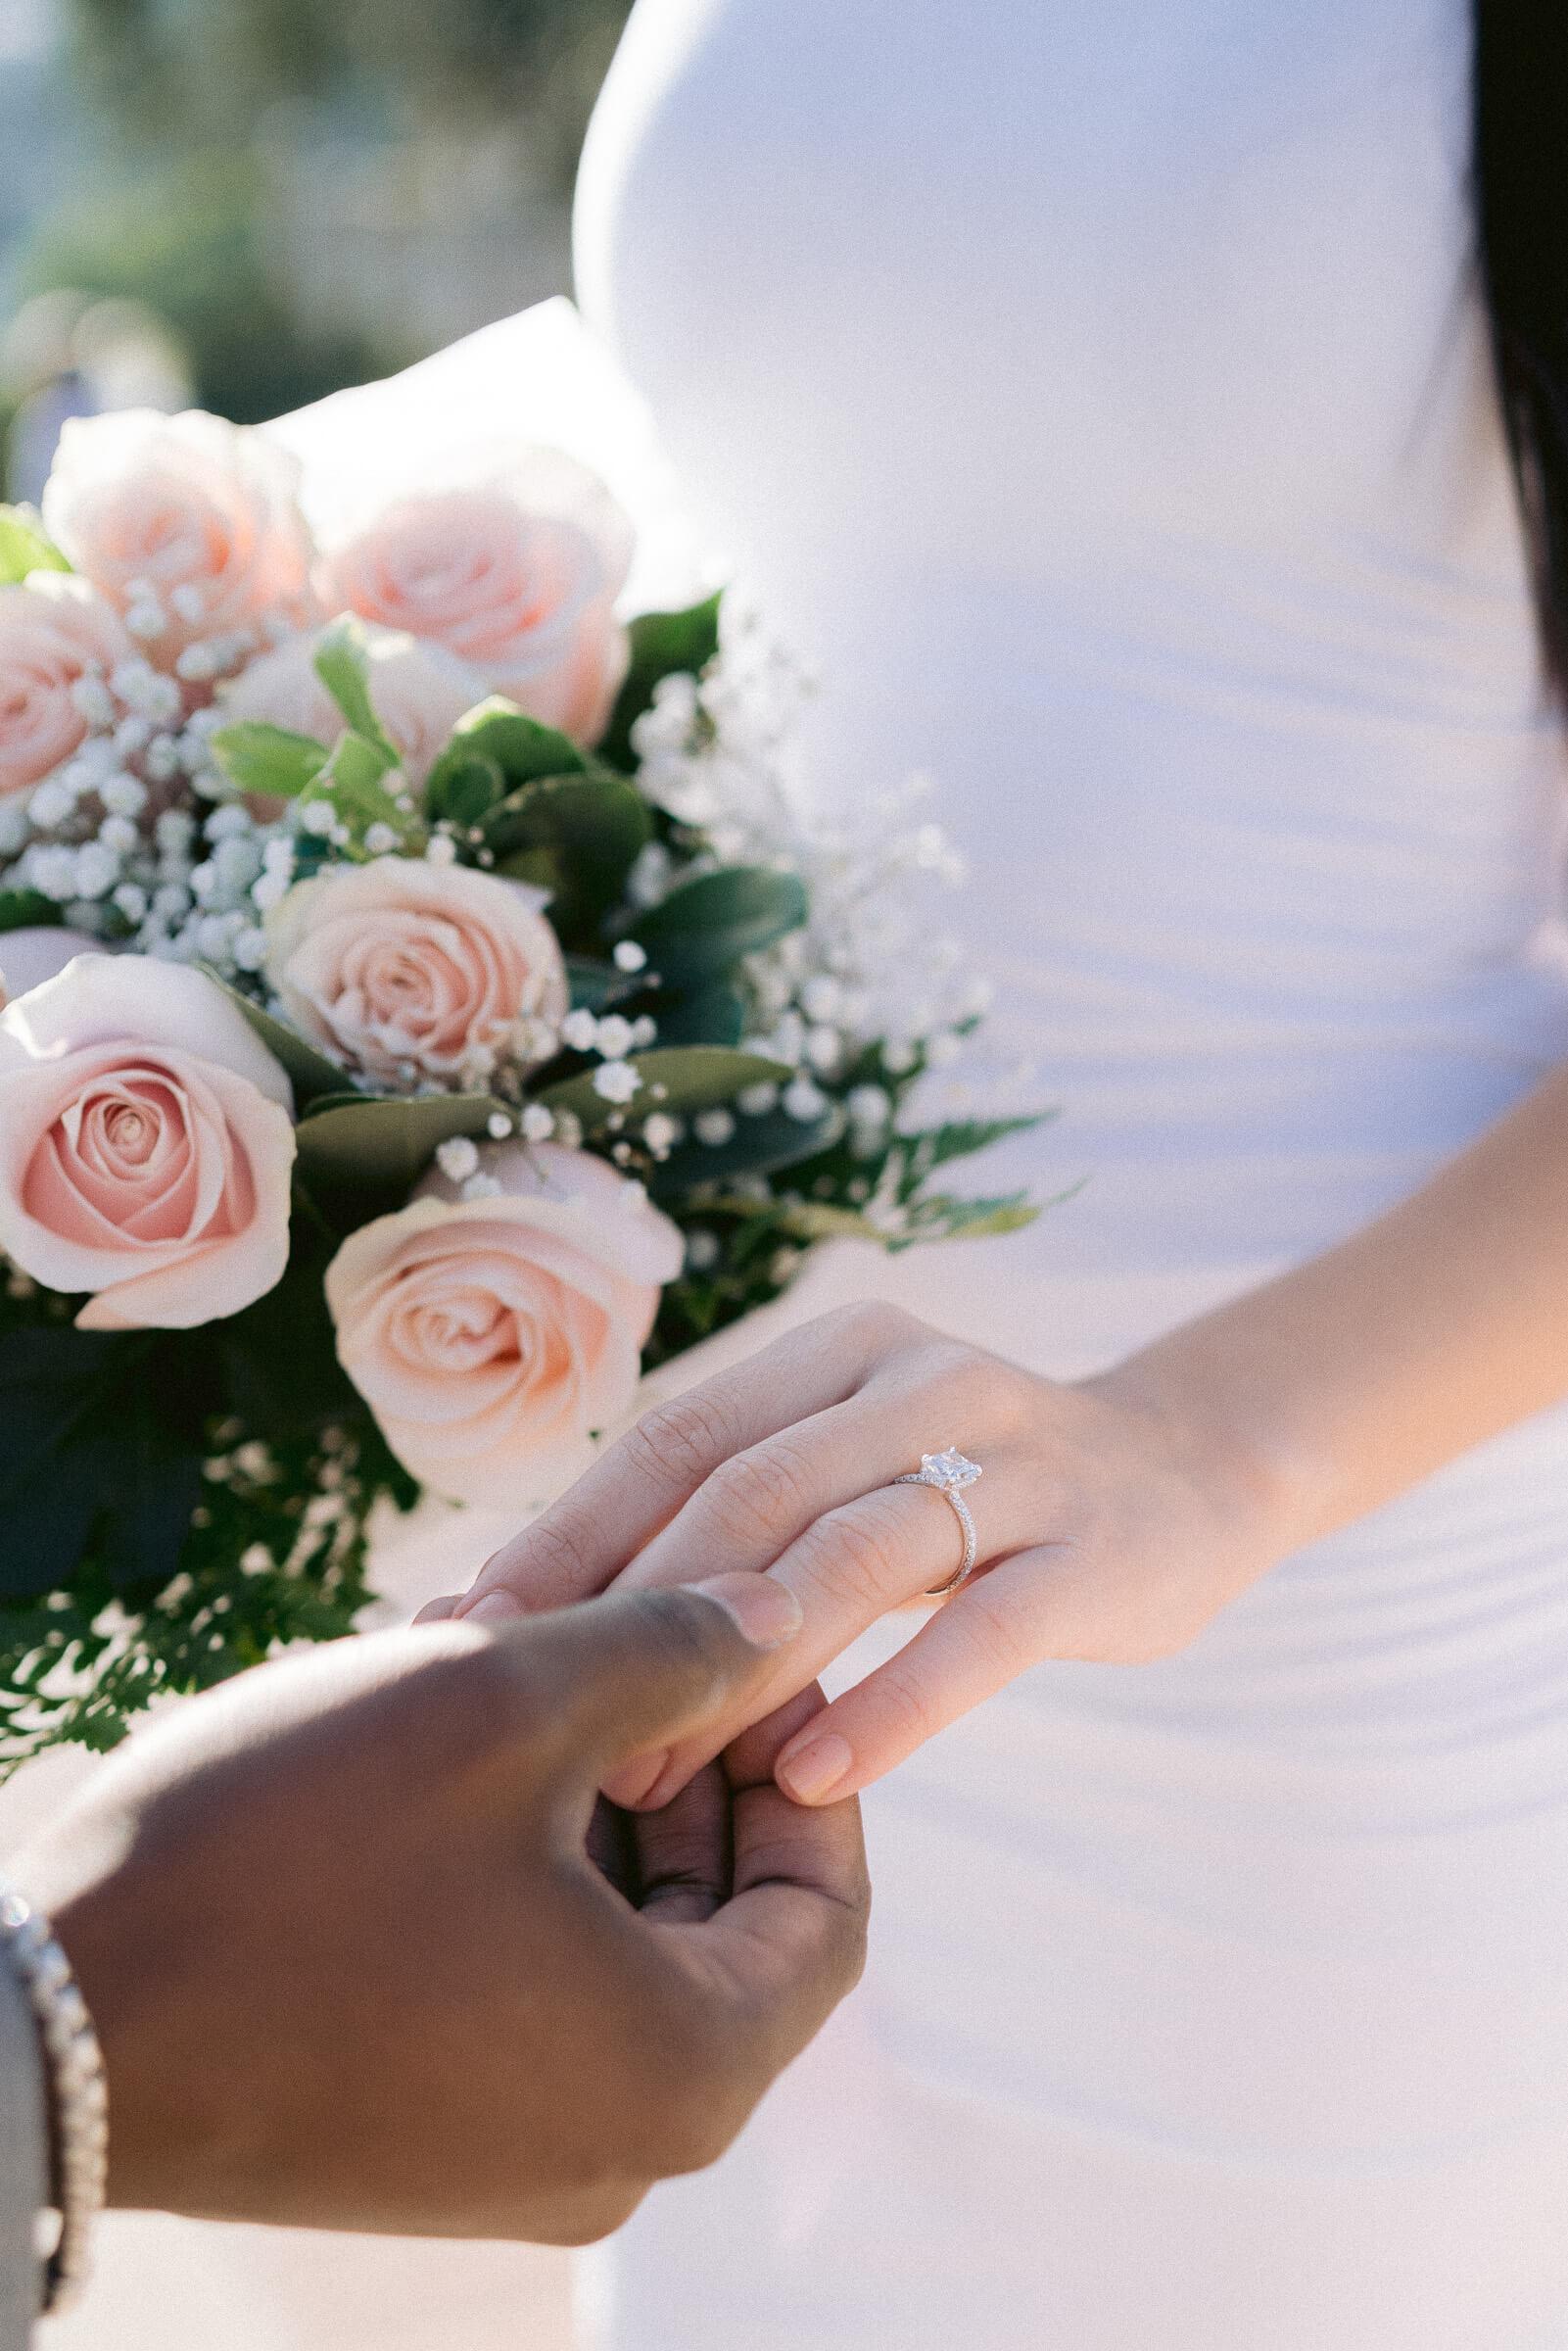 ucla-los-angeles-proposal-photographer-24.jpg